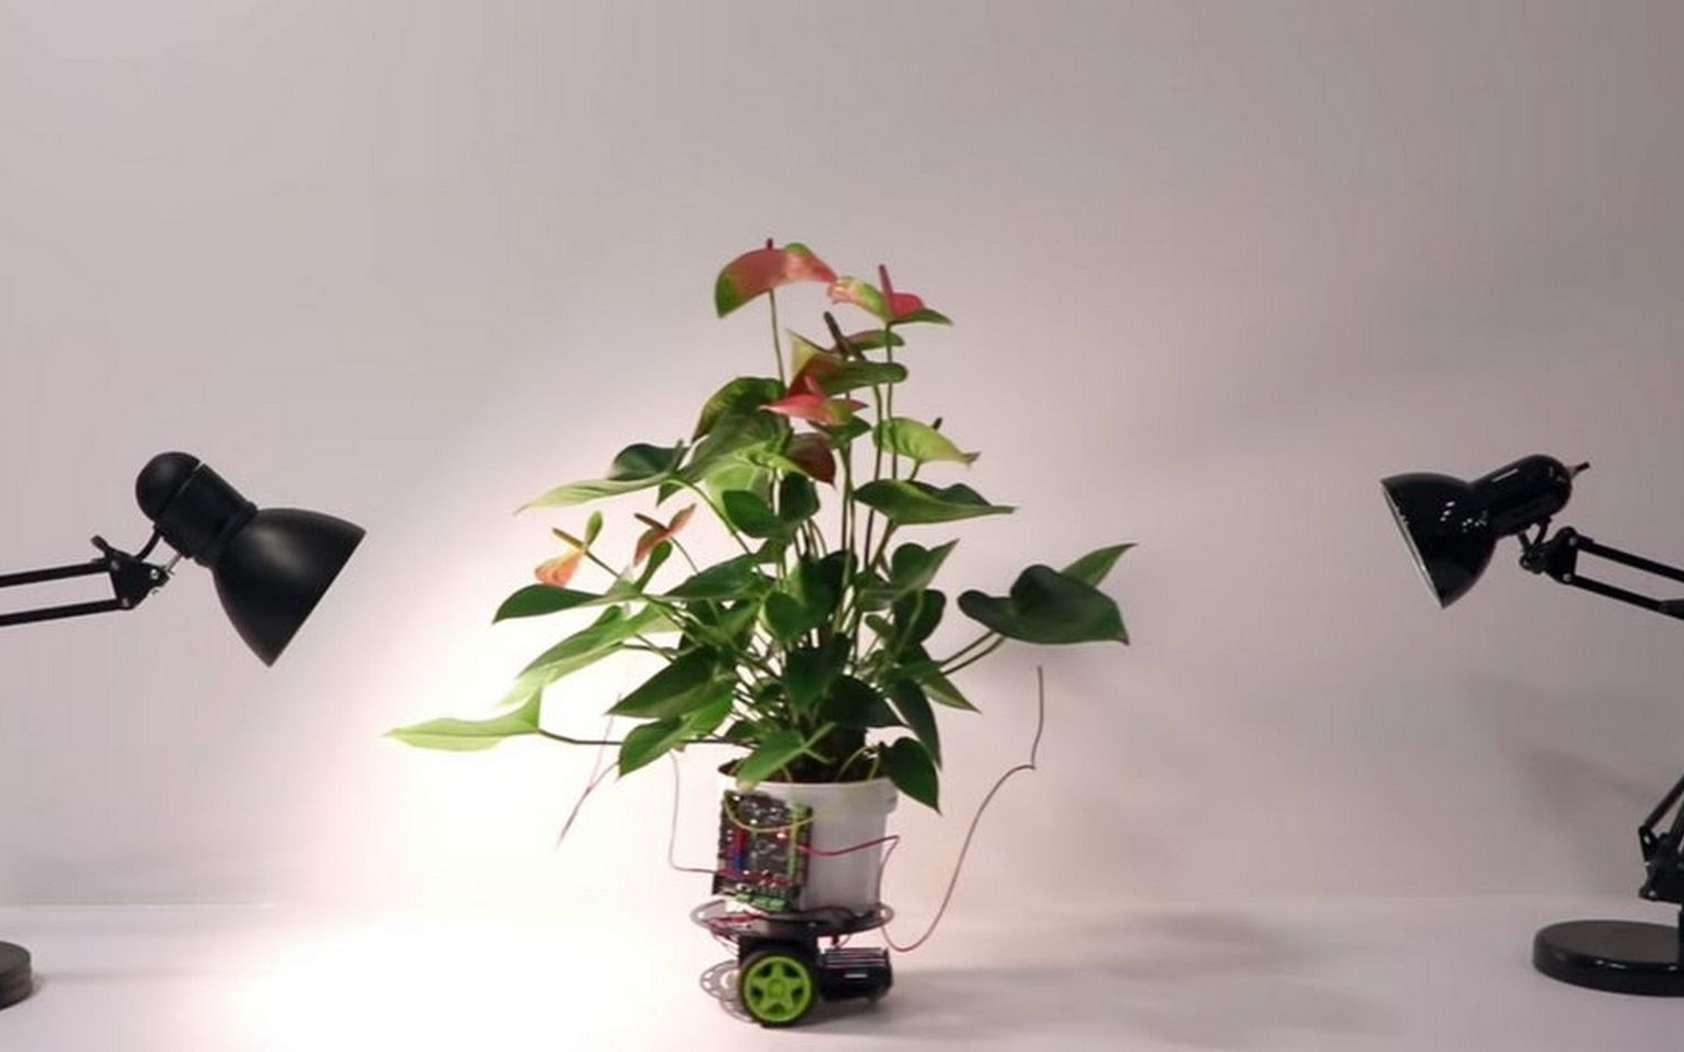 La plante cyborg Elowan développée par le MIT. © Harpreet Sareen